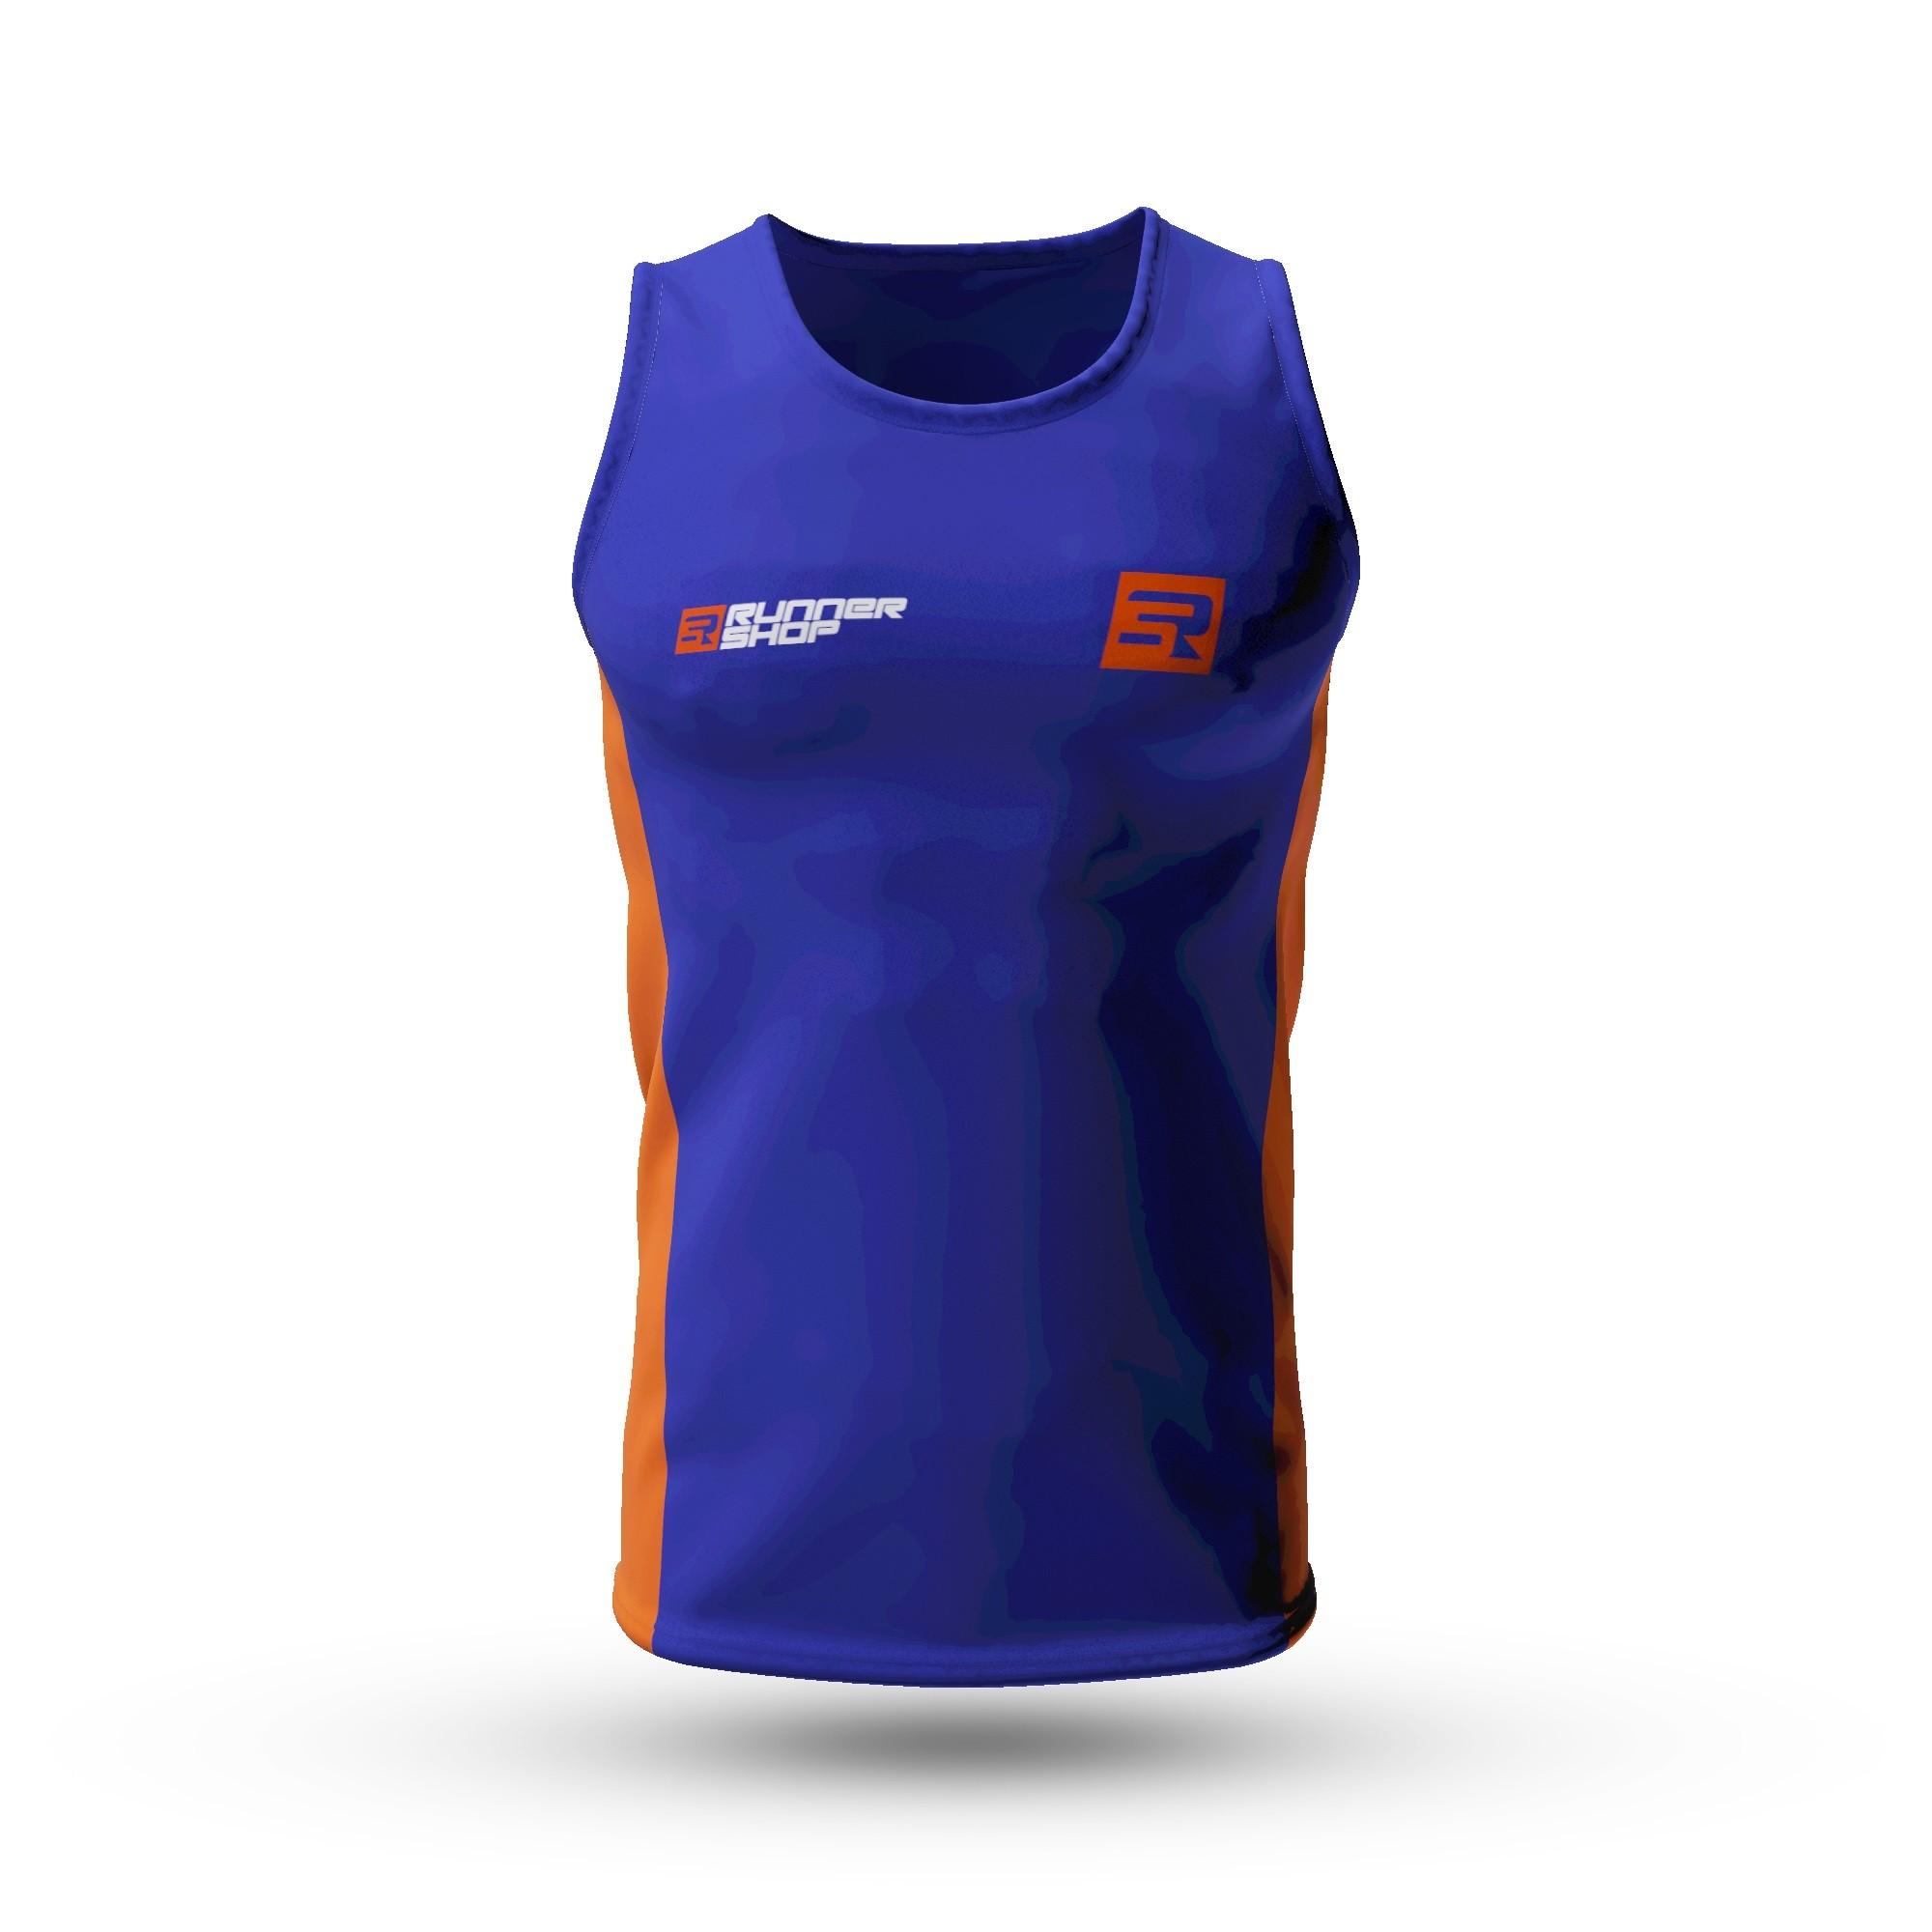 Camiseta Team Regata - Baby Look| RUNNER SHOP